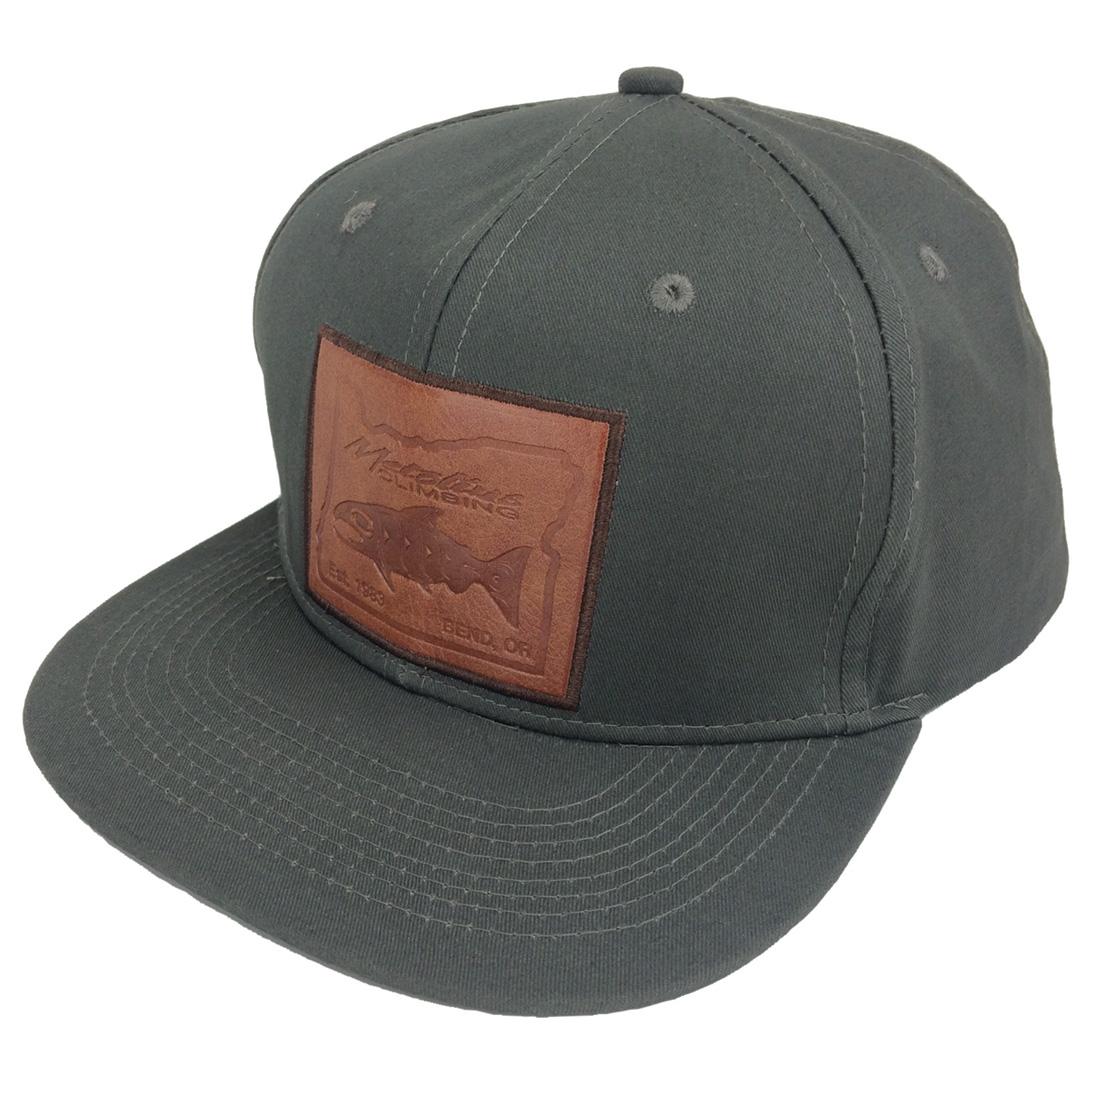 7bd48fff9e6 Leather Patch Hat - Metolius Climbing